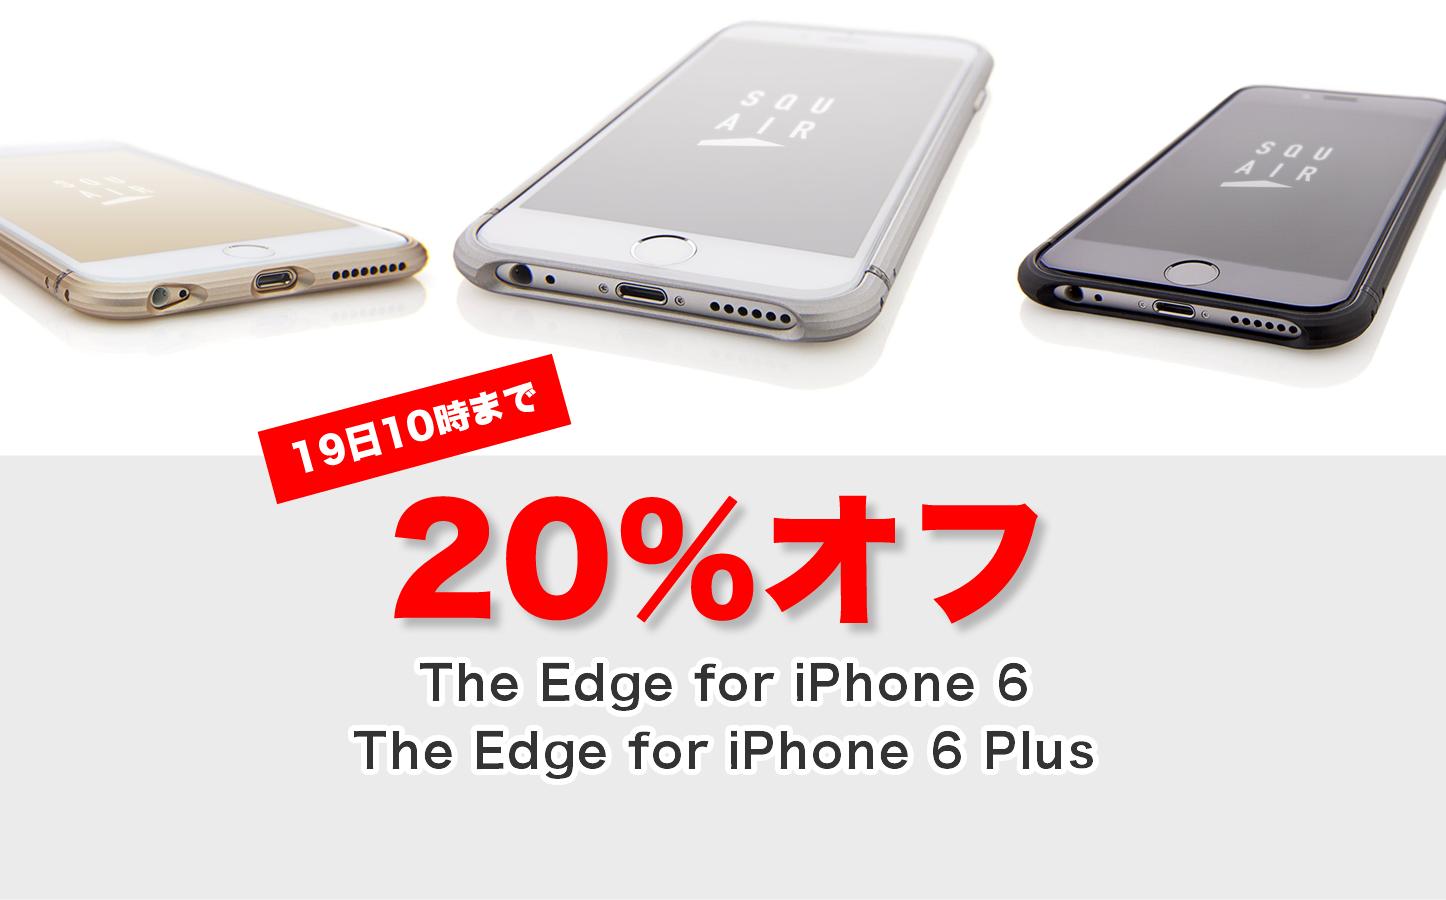 The Edge Sale